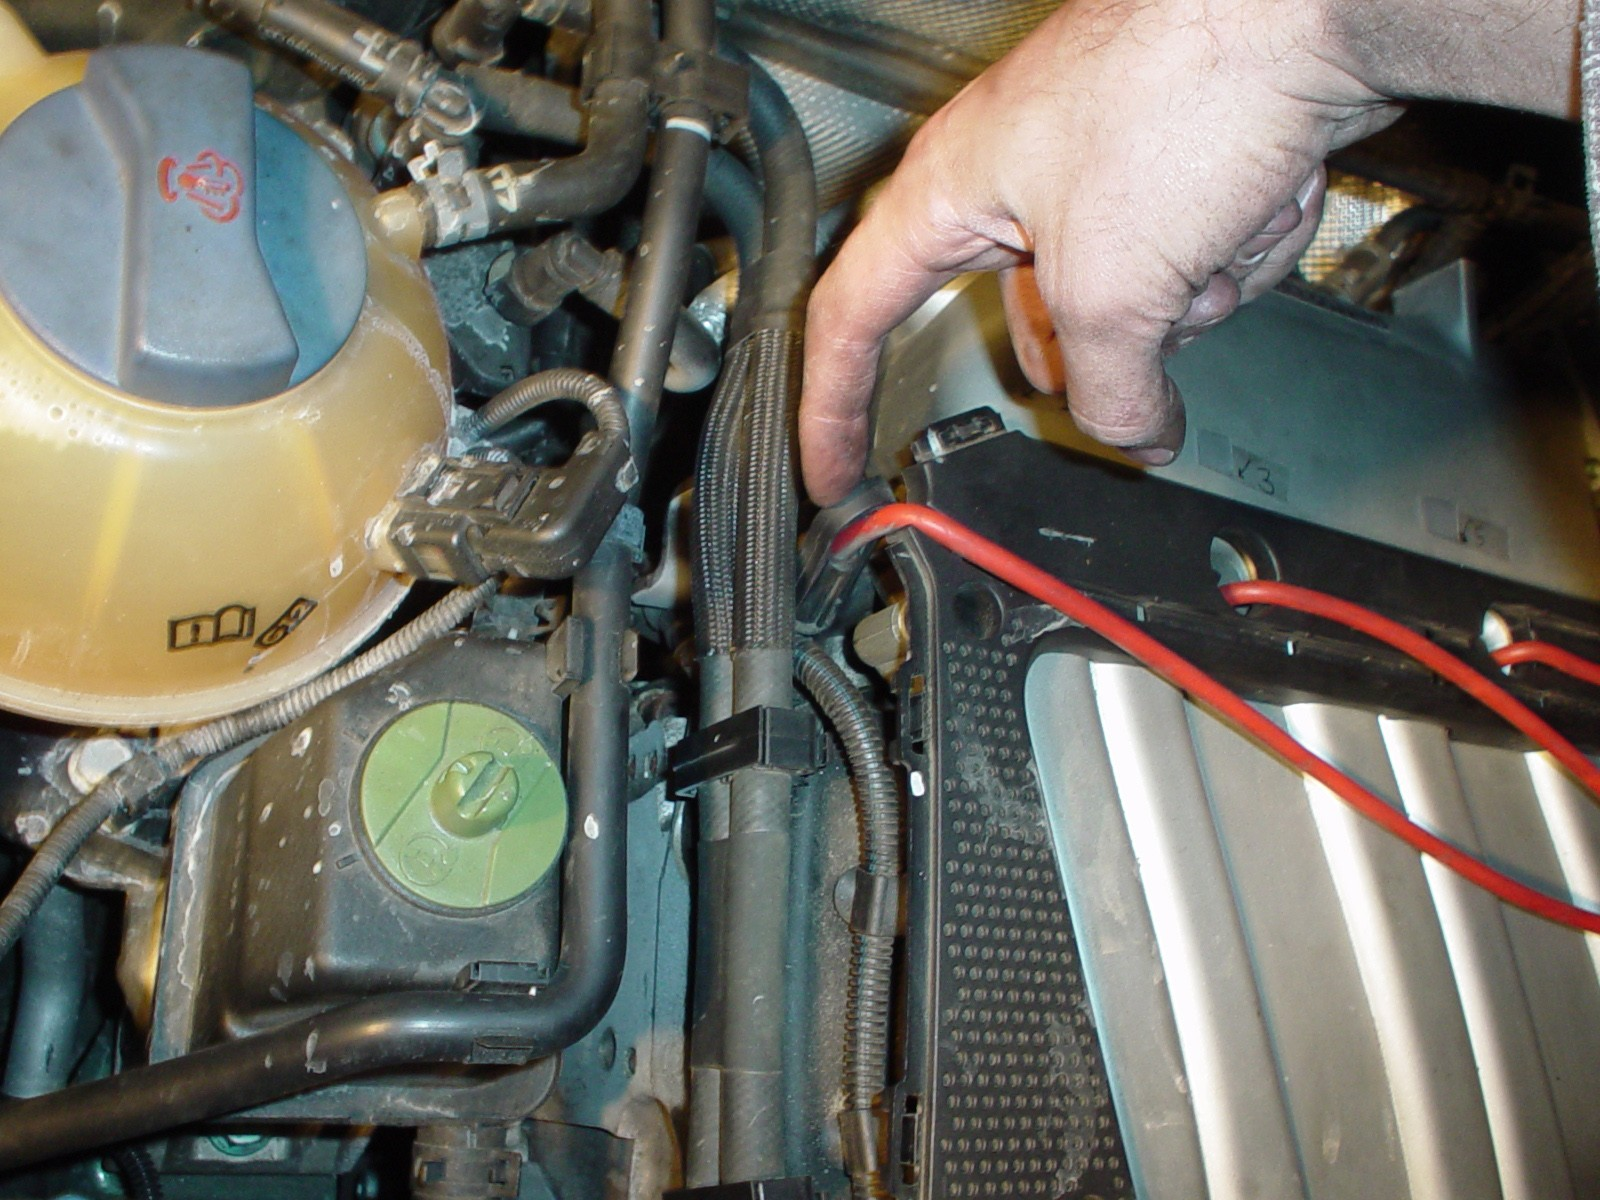 2001 Vw Jetta Vr6 Engine Diagram Timing Belt Vwvortex Diy Replacing Spark Plugs And Plug Wires On